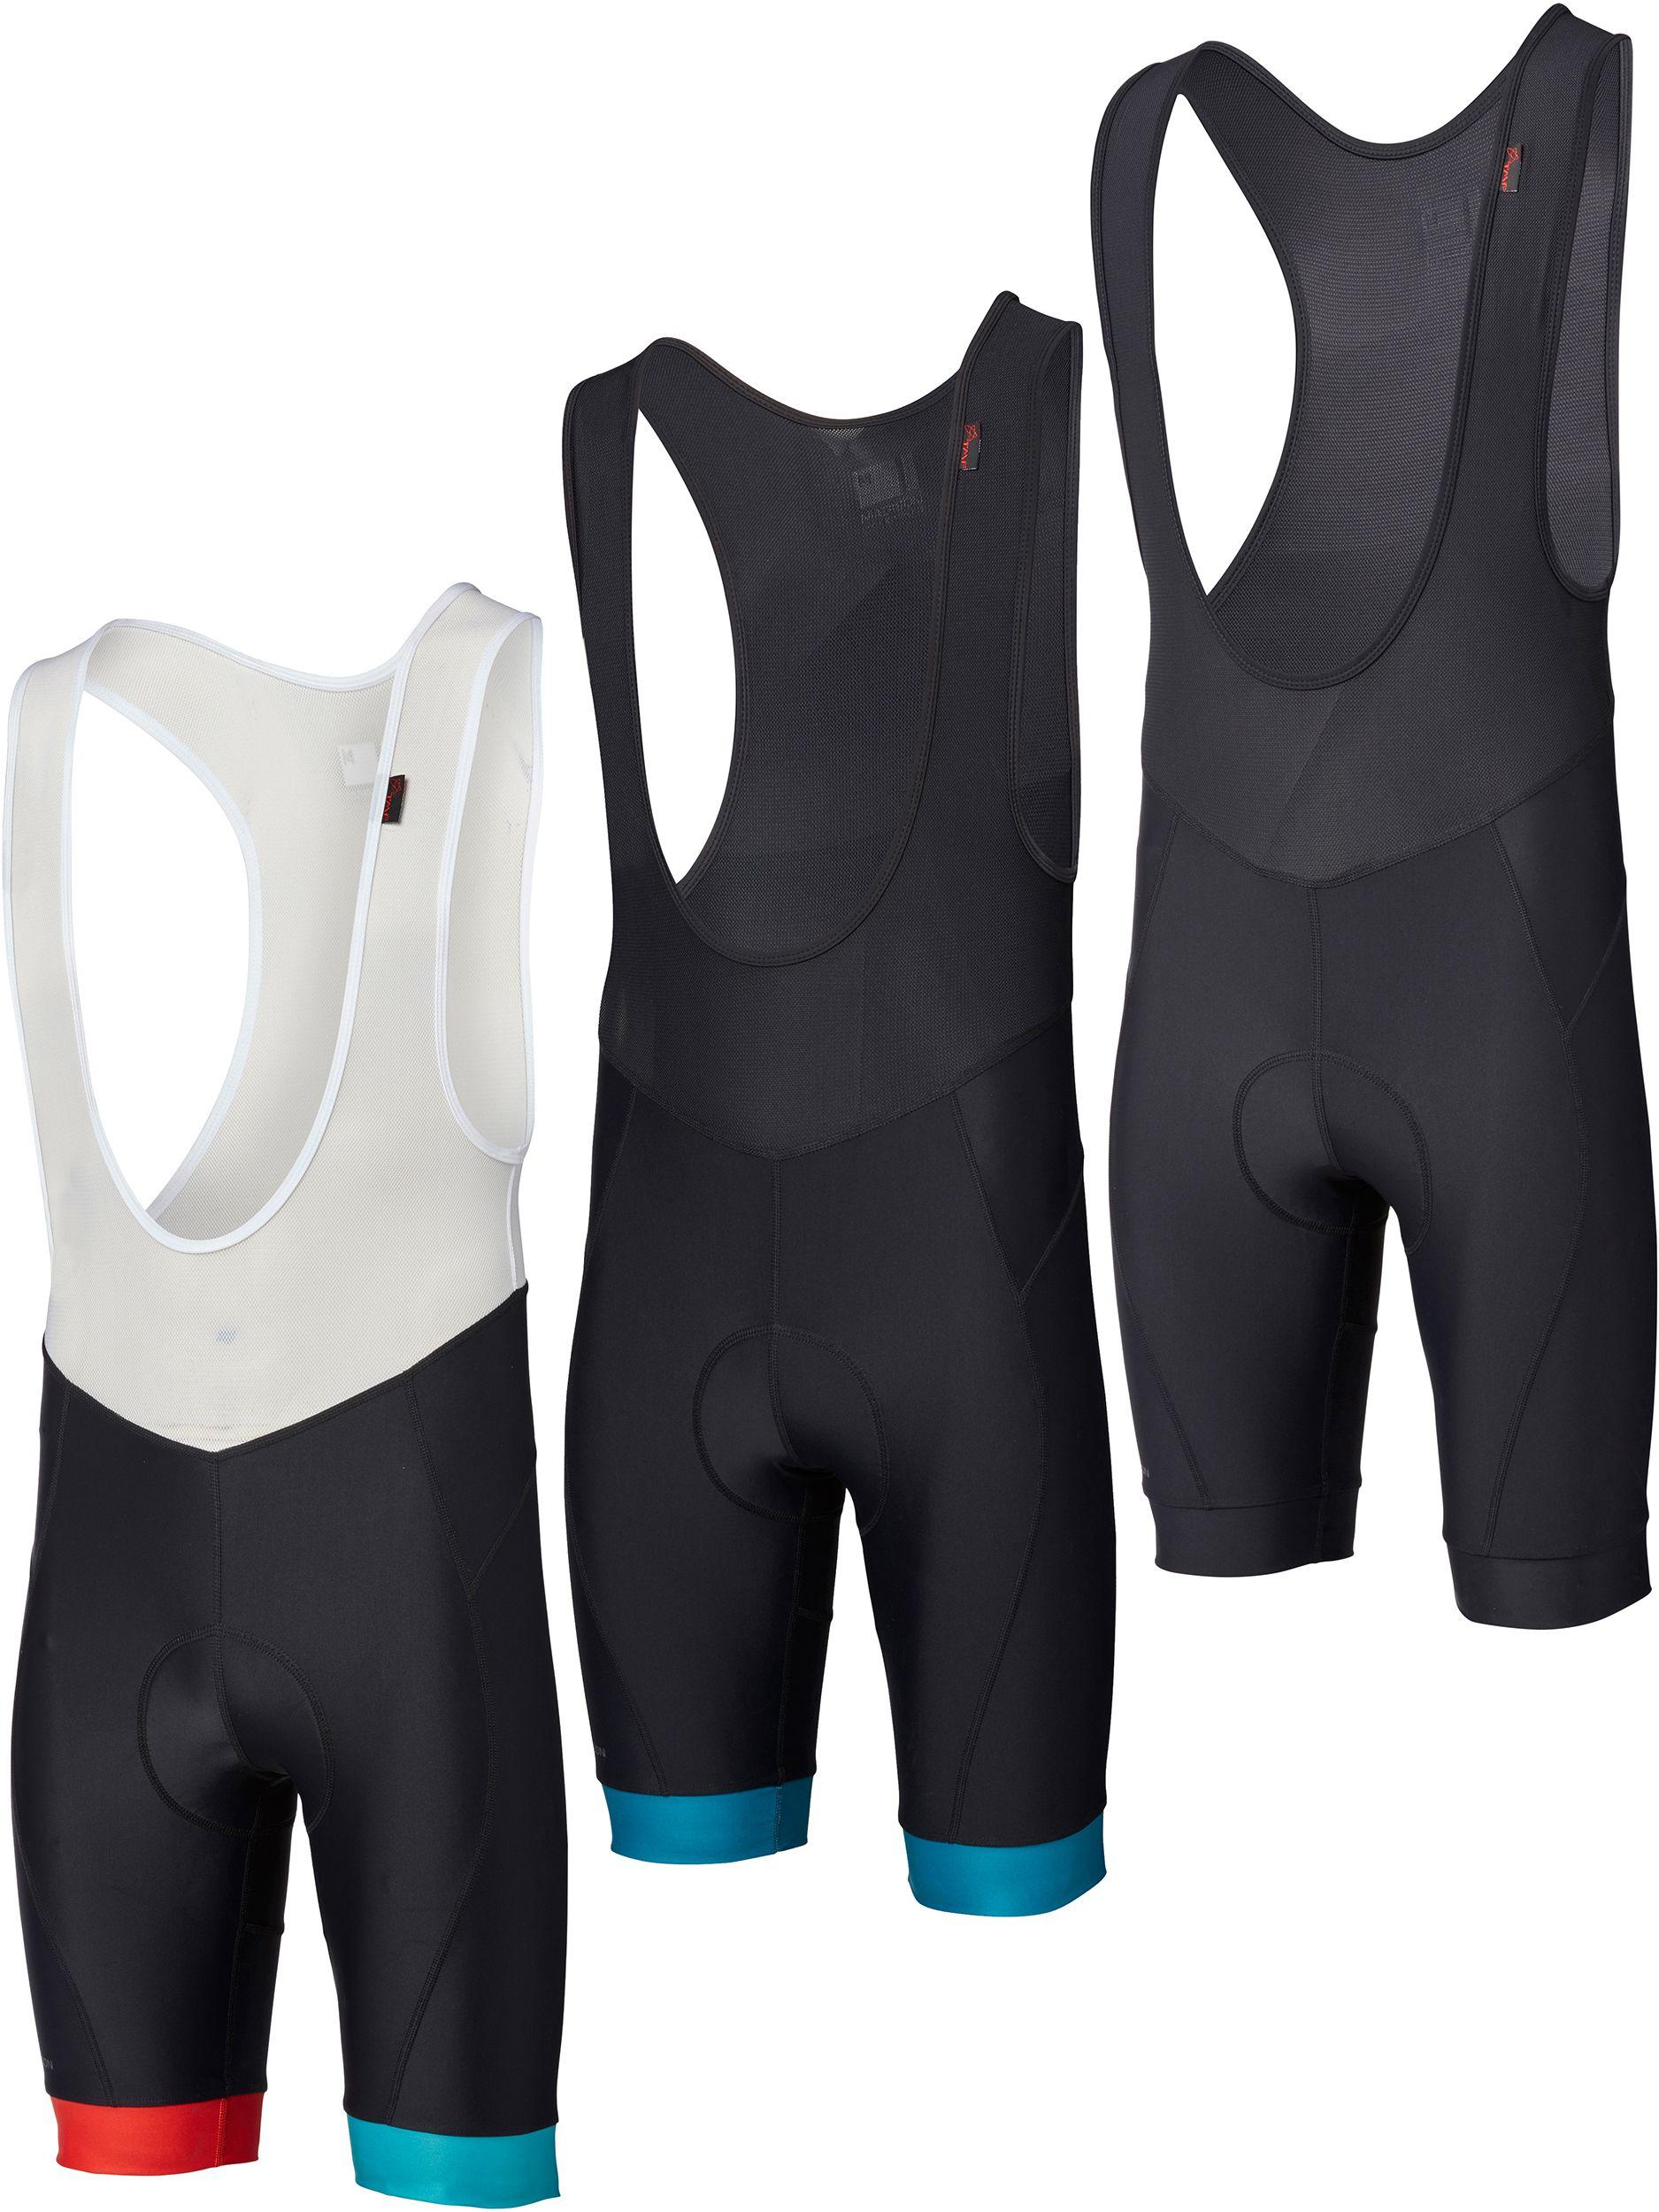 Madison Sportive Bib Shorts 2021 | bike pants